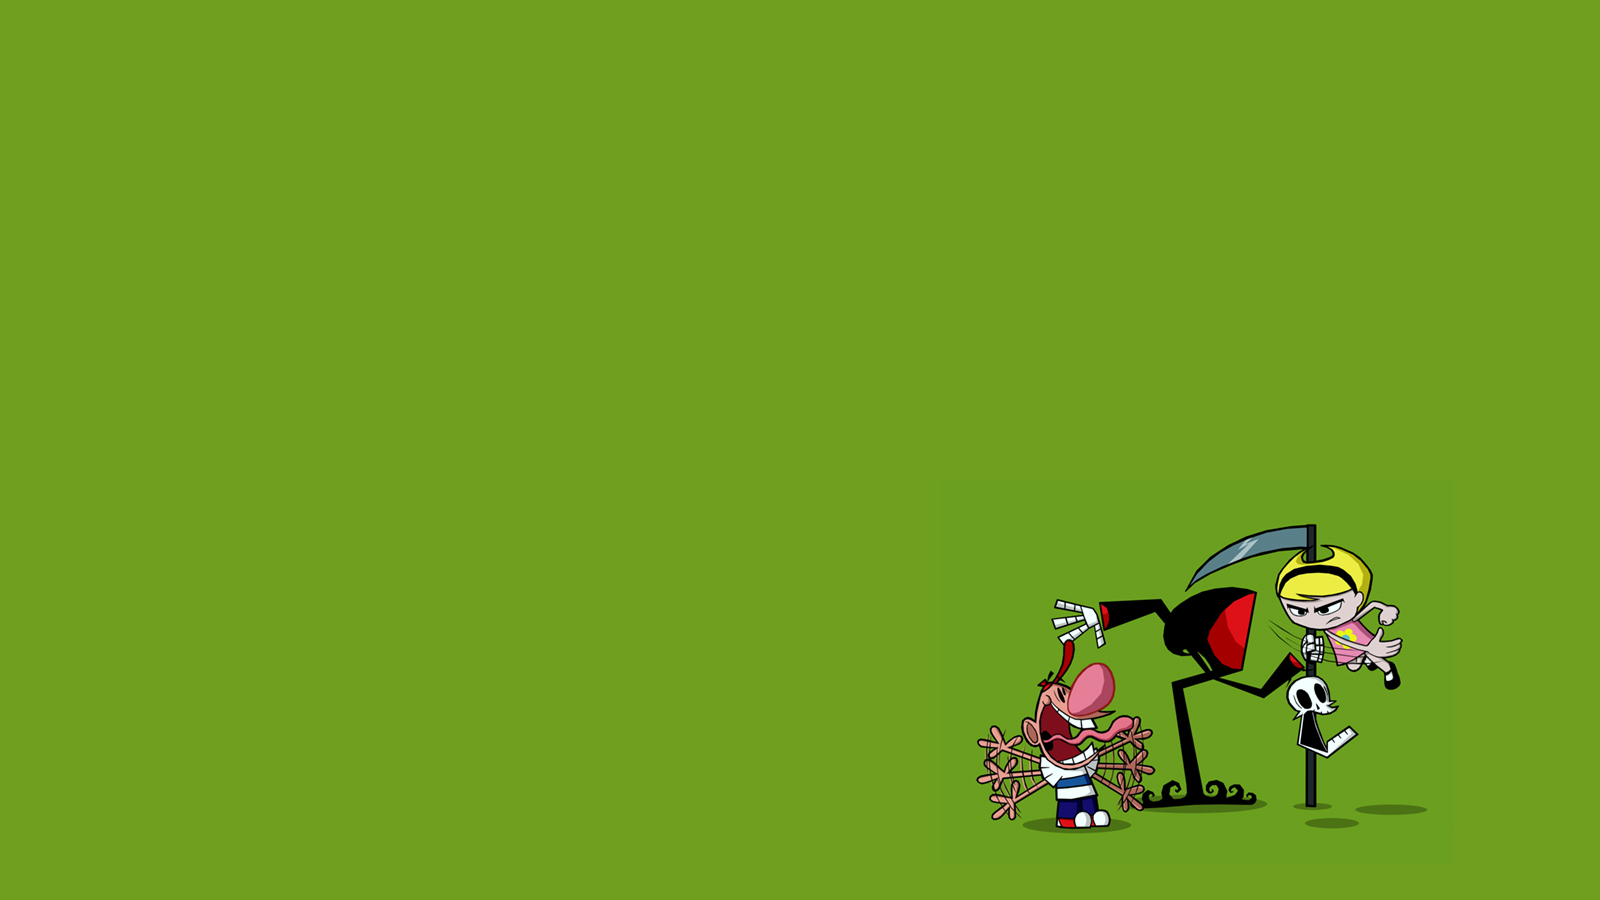 green dell desktop wallpapers 1600x900 - photo #21